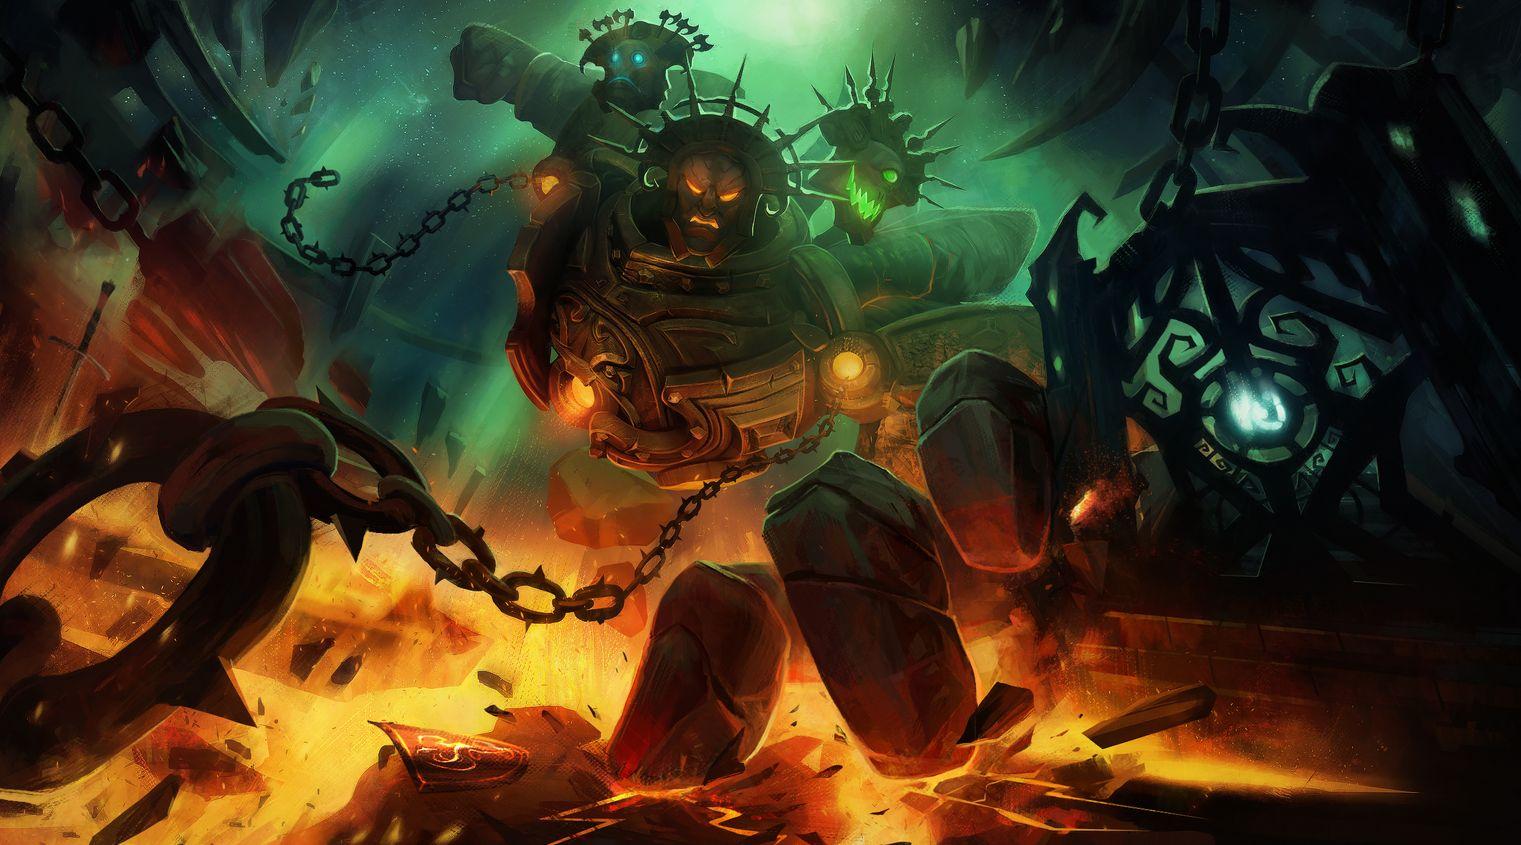 Wargaming announces Pagan Online, a dungeon-crawling RPG